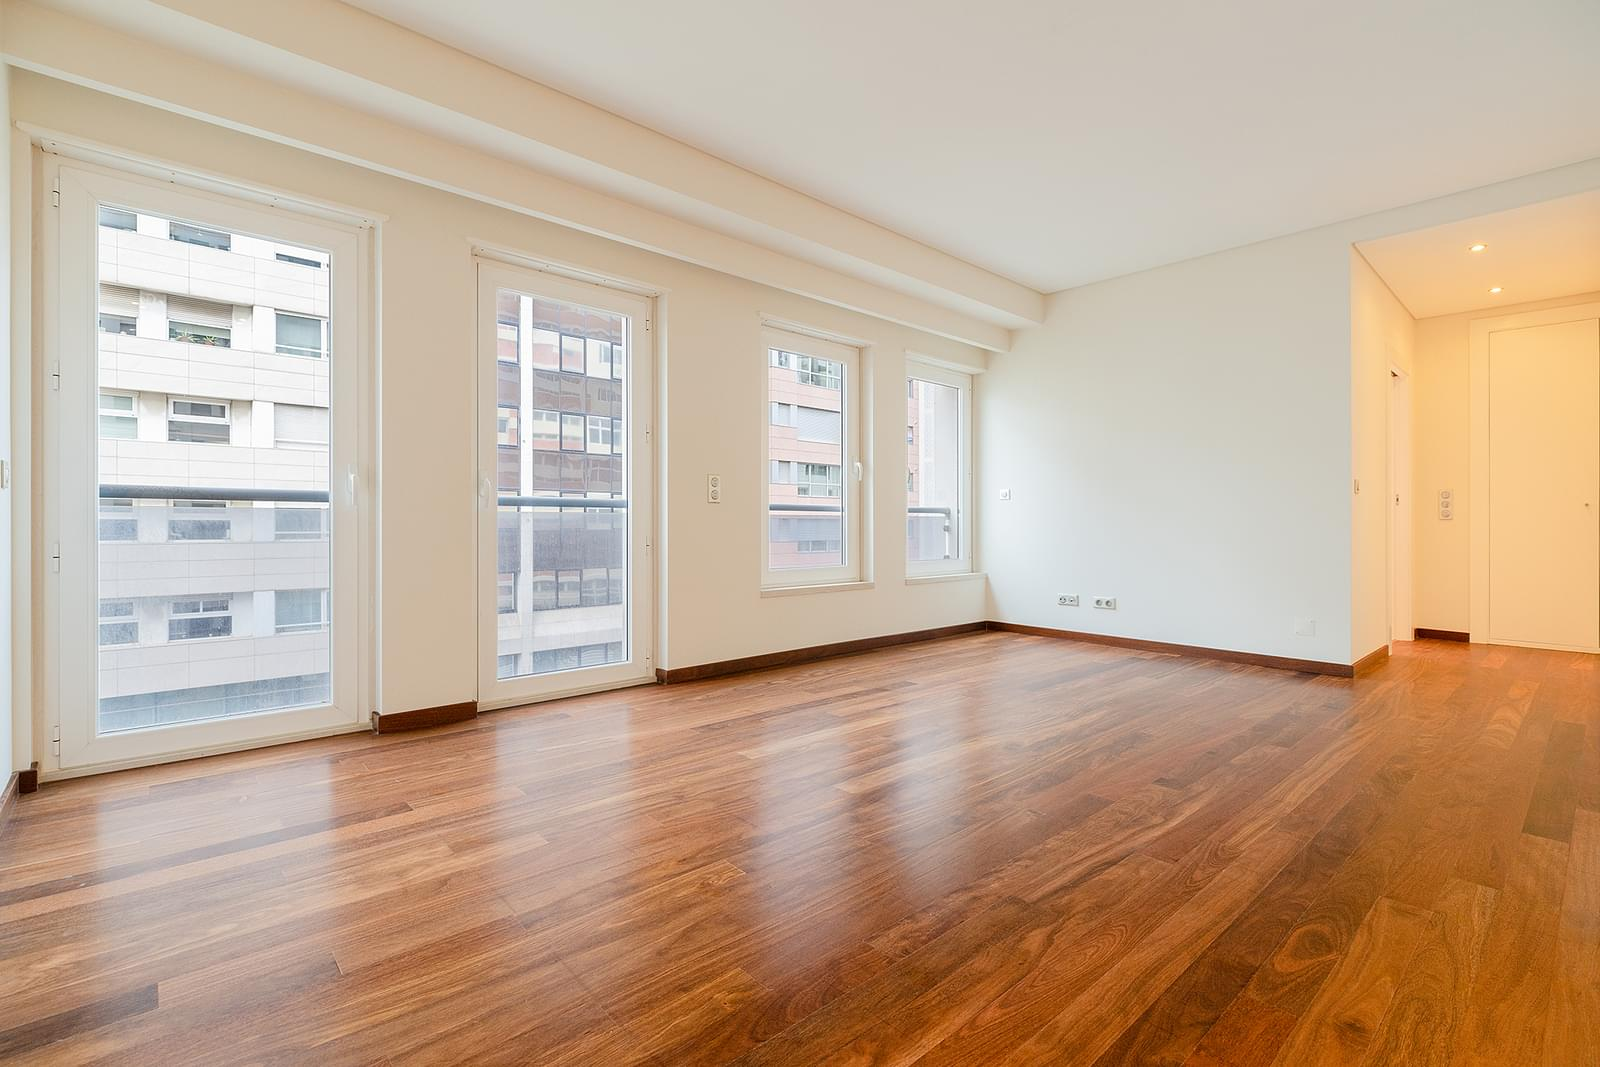 pf18533-apartamento-t4-lisboa-378fecf7-64a4-4a5c-ab2d-2926c188b7fa